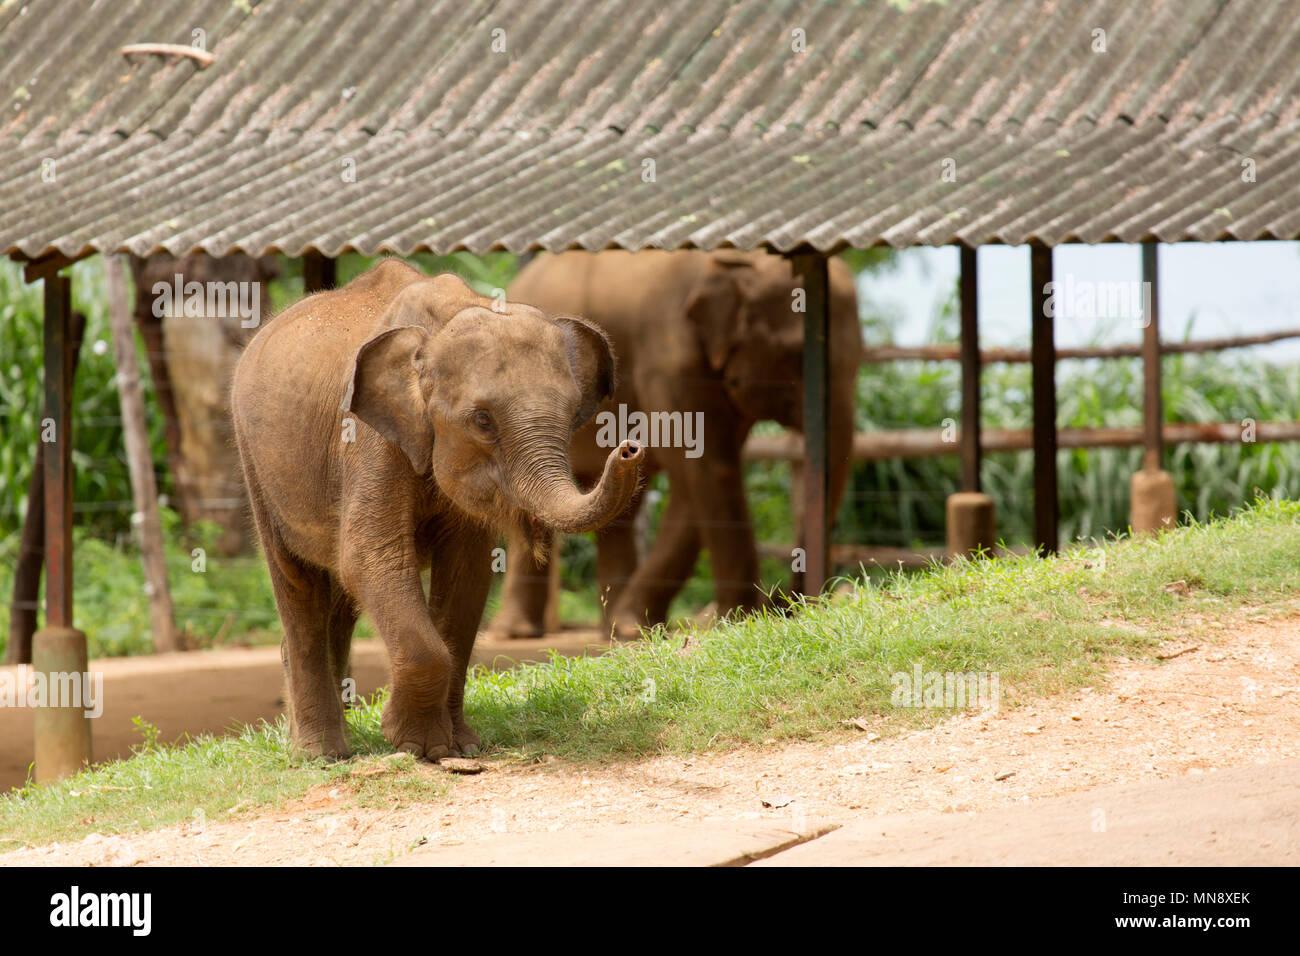 Gli elefanti al Udwawalawe Elephant Transit Home a Uwawalawe parco nazionale in Sri Lanka. Immagini Stock